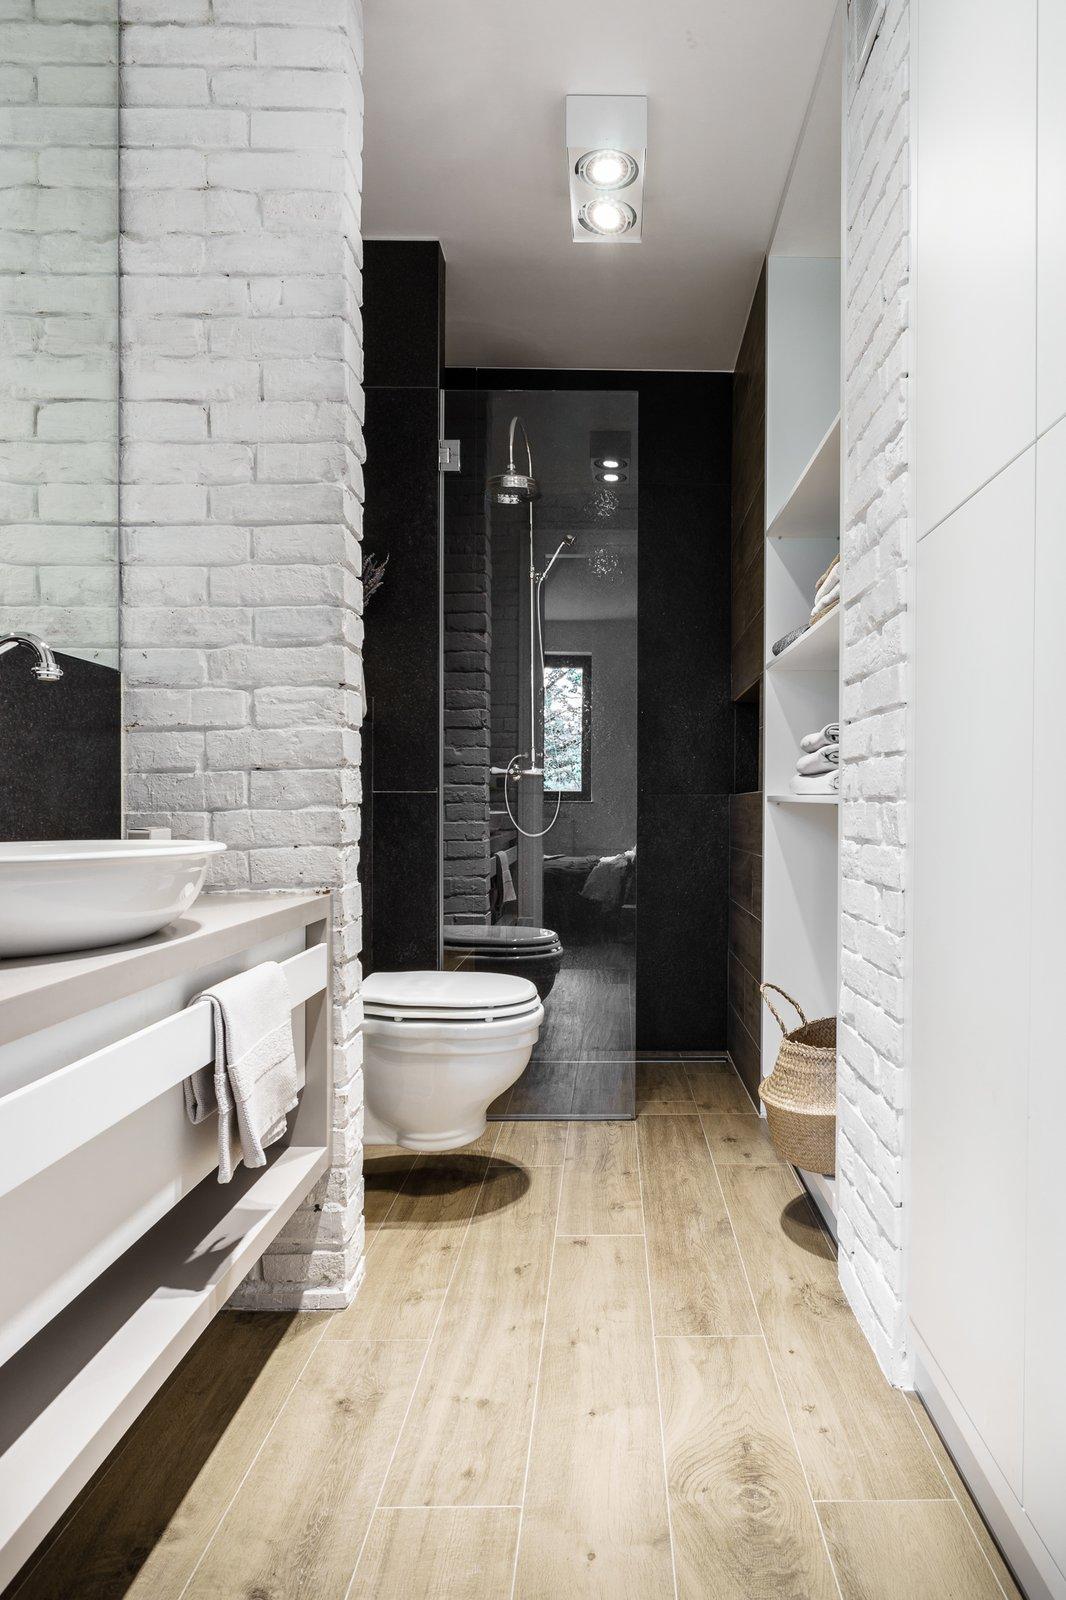 Bath Room, Corner Shower, Light Hardwood Floor, Vessel Sink, Engineered Quartz Counter, Enclosed Shower, Ceiling Lighting, and One Piece Toilet  Loft in Poland